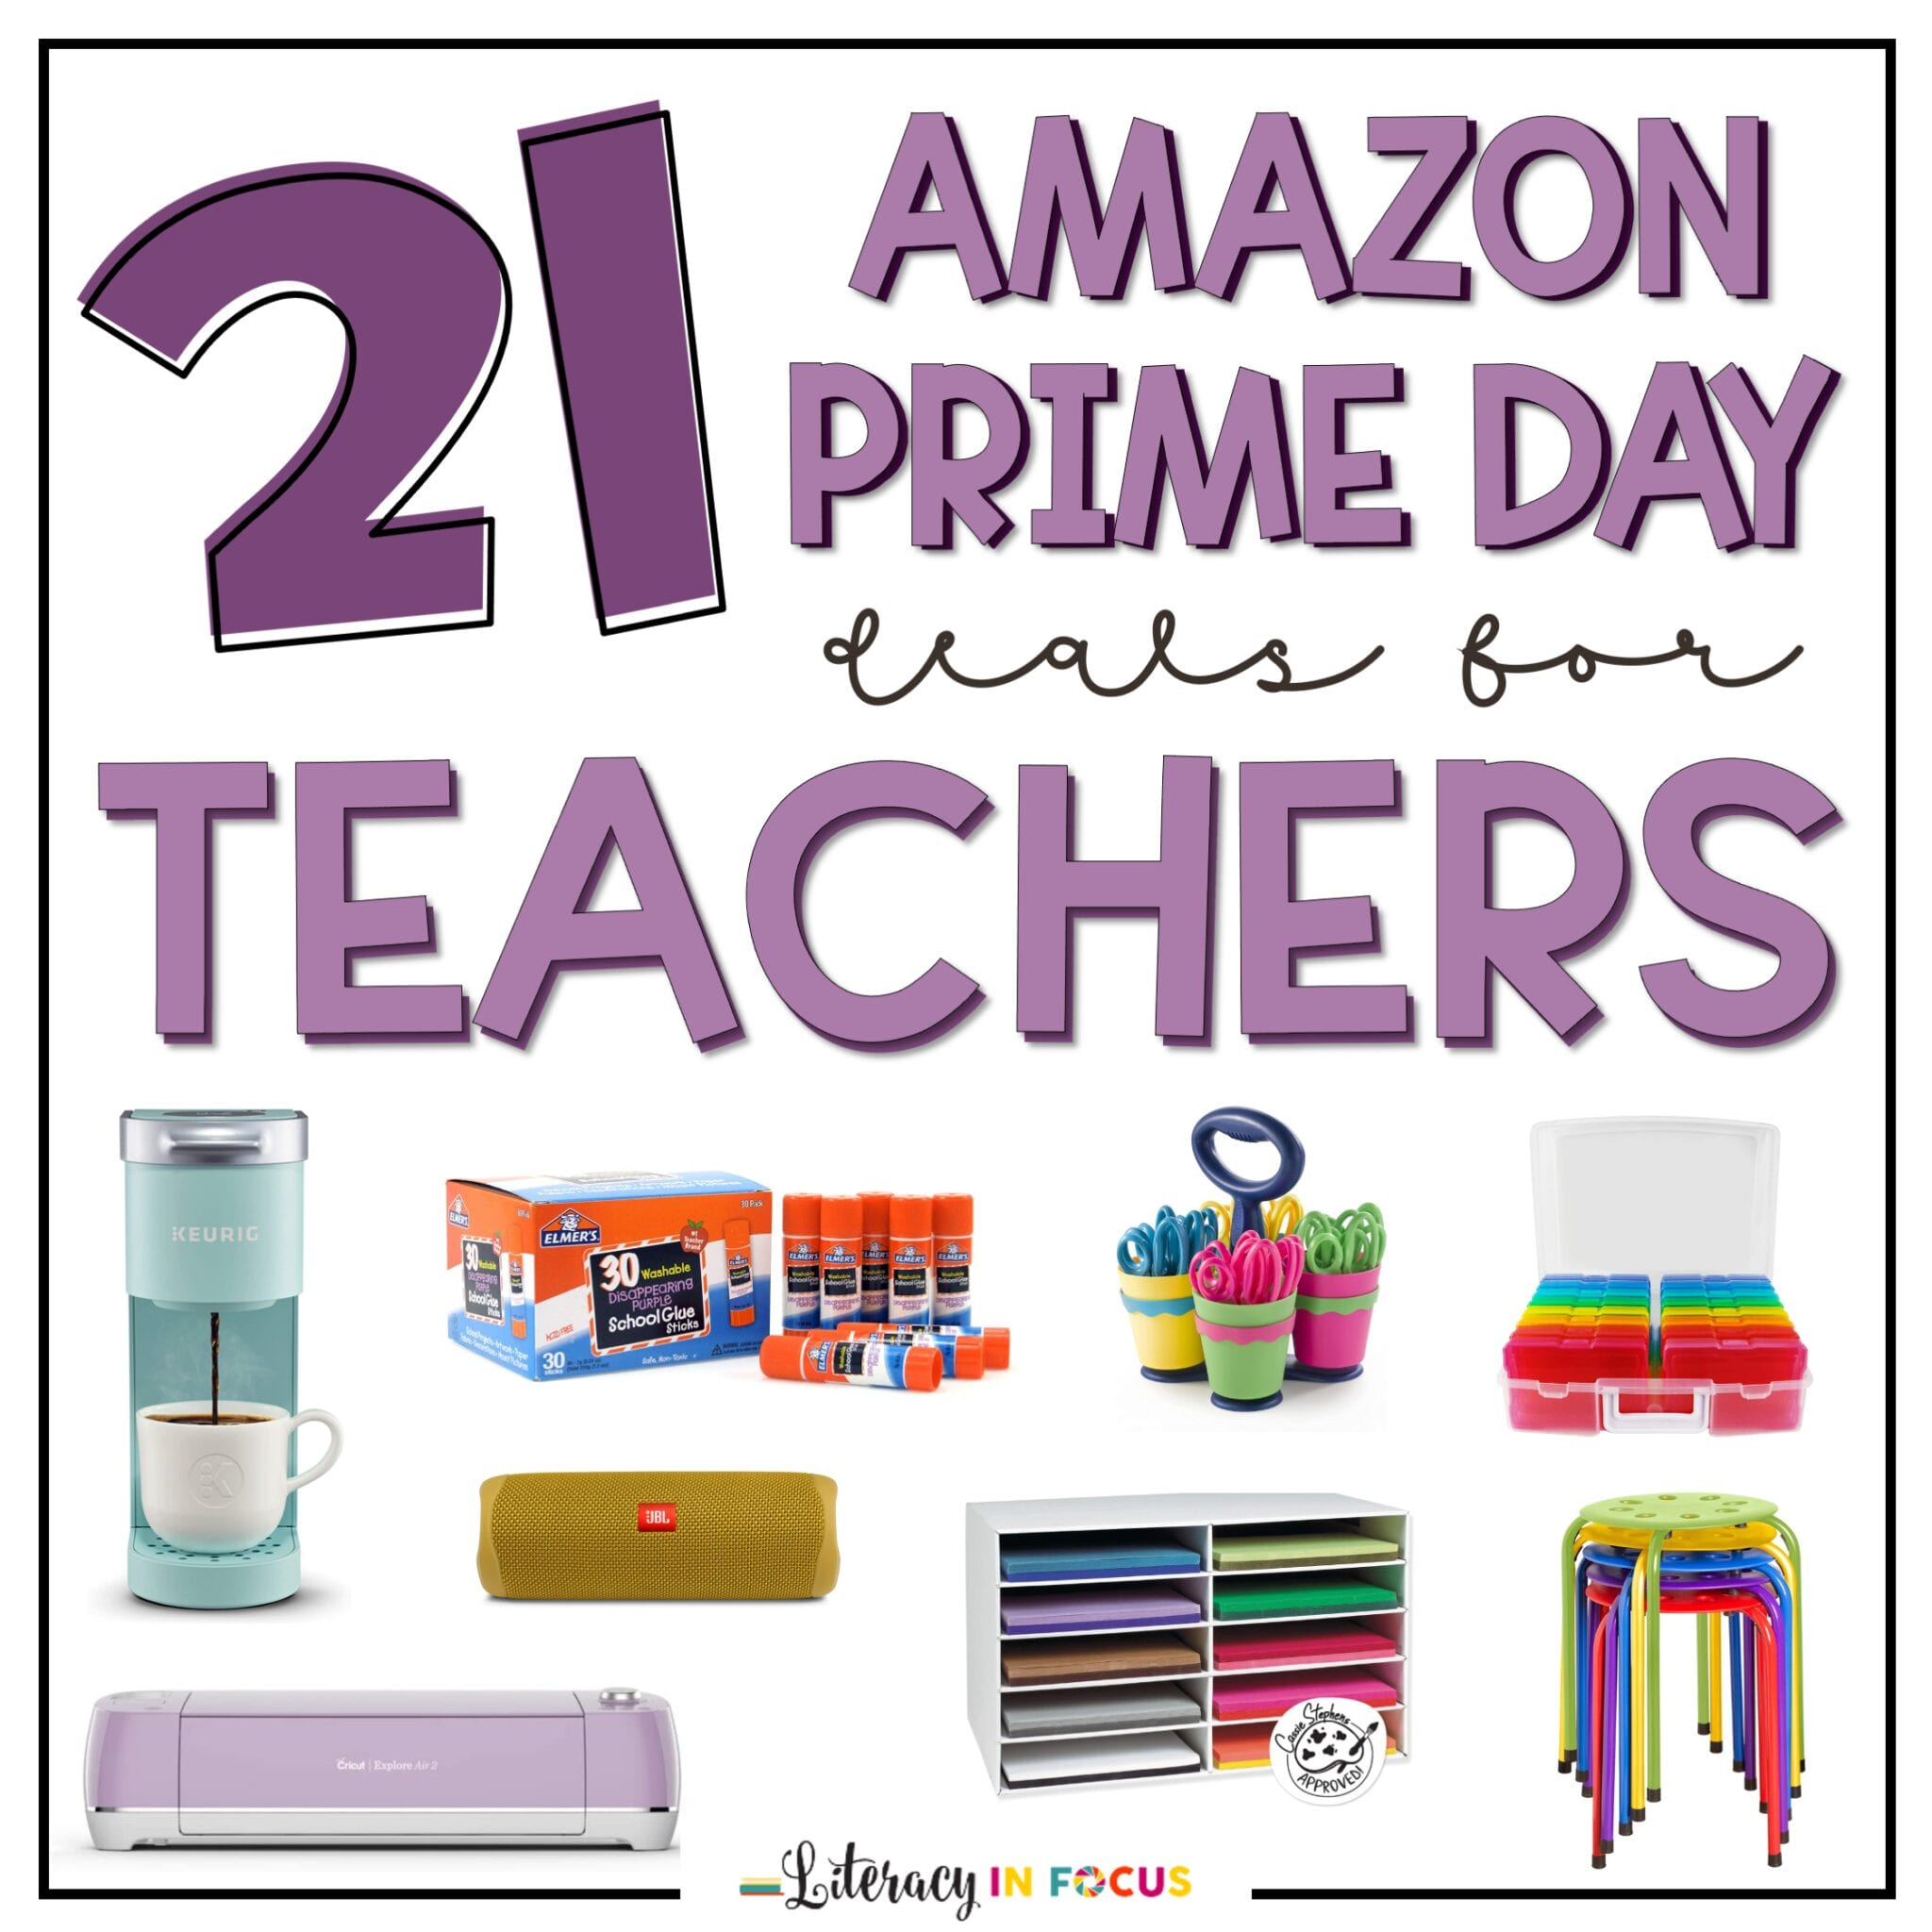 Amazon Prime Day deals for teachers